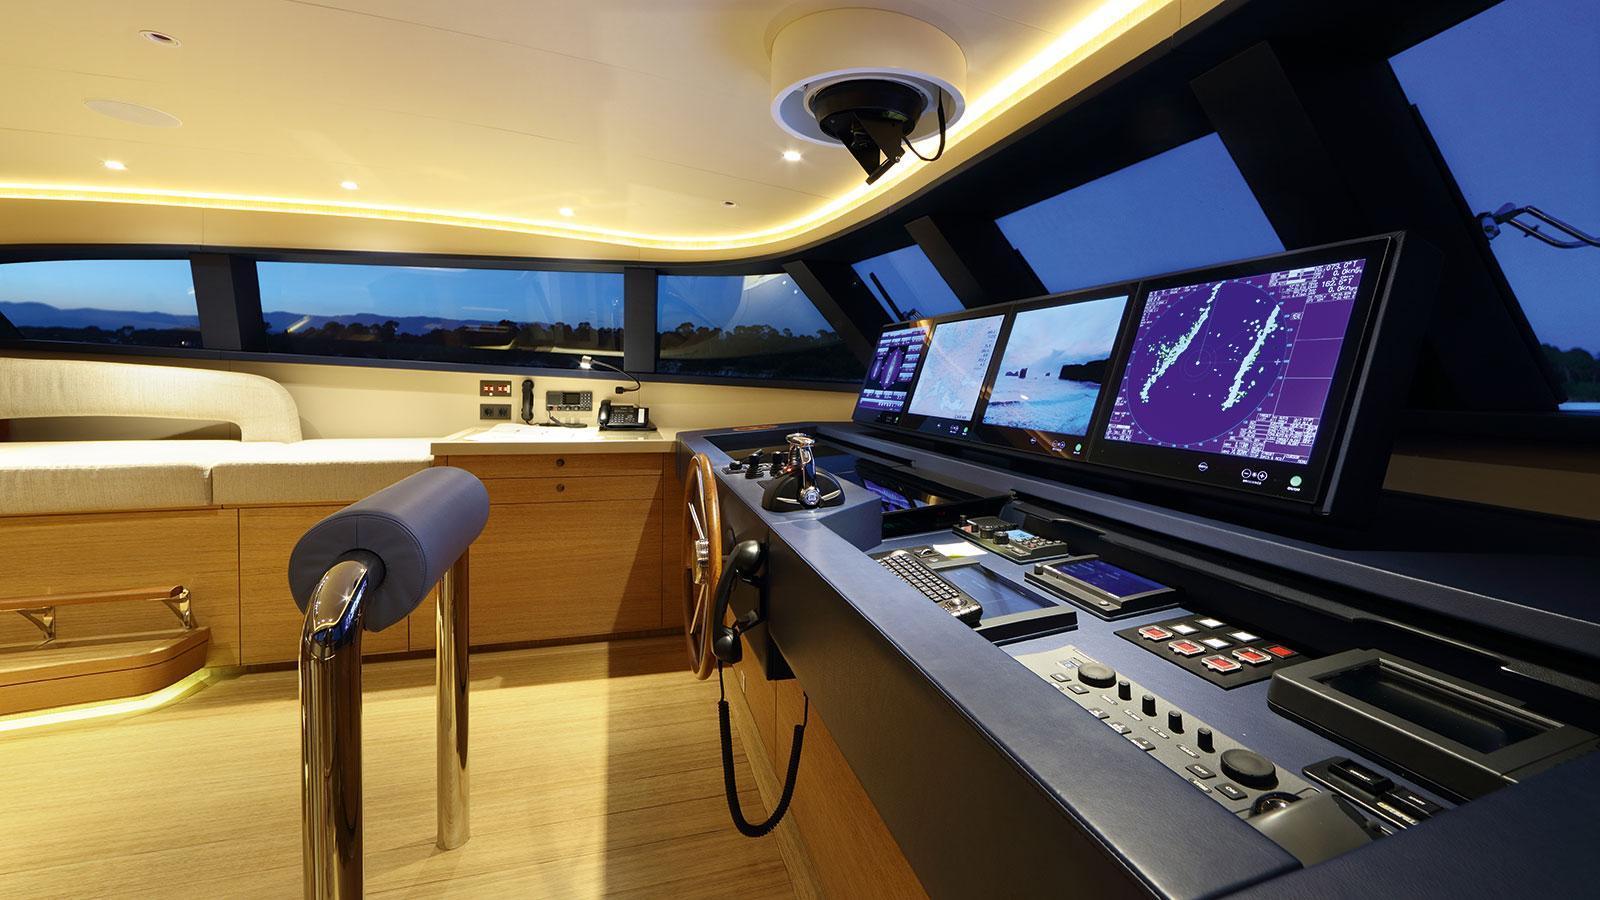 solis-motor-yacht-mulder-2015-34m-bridge